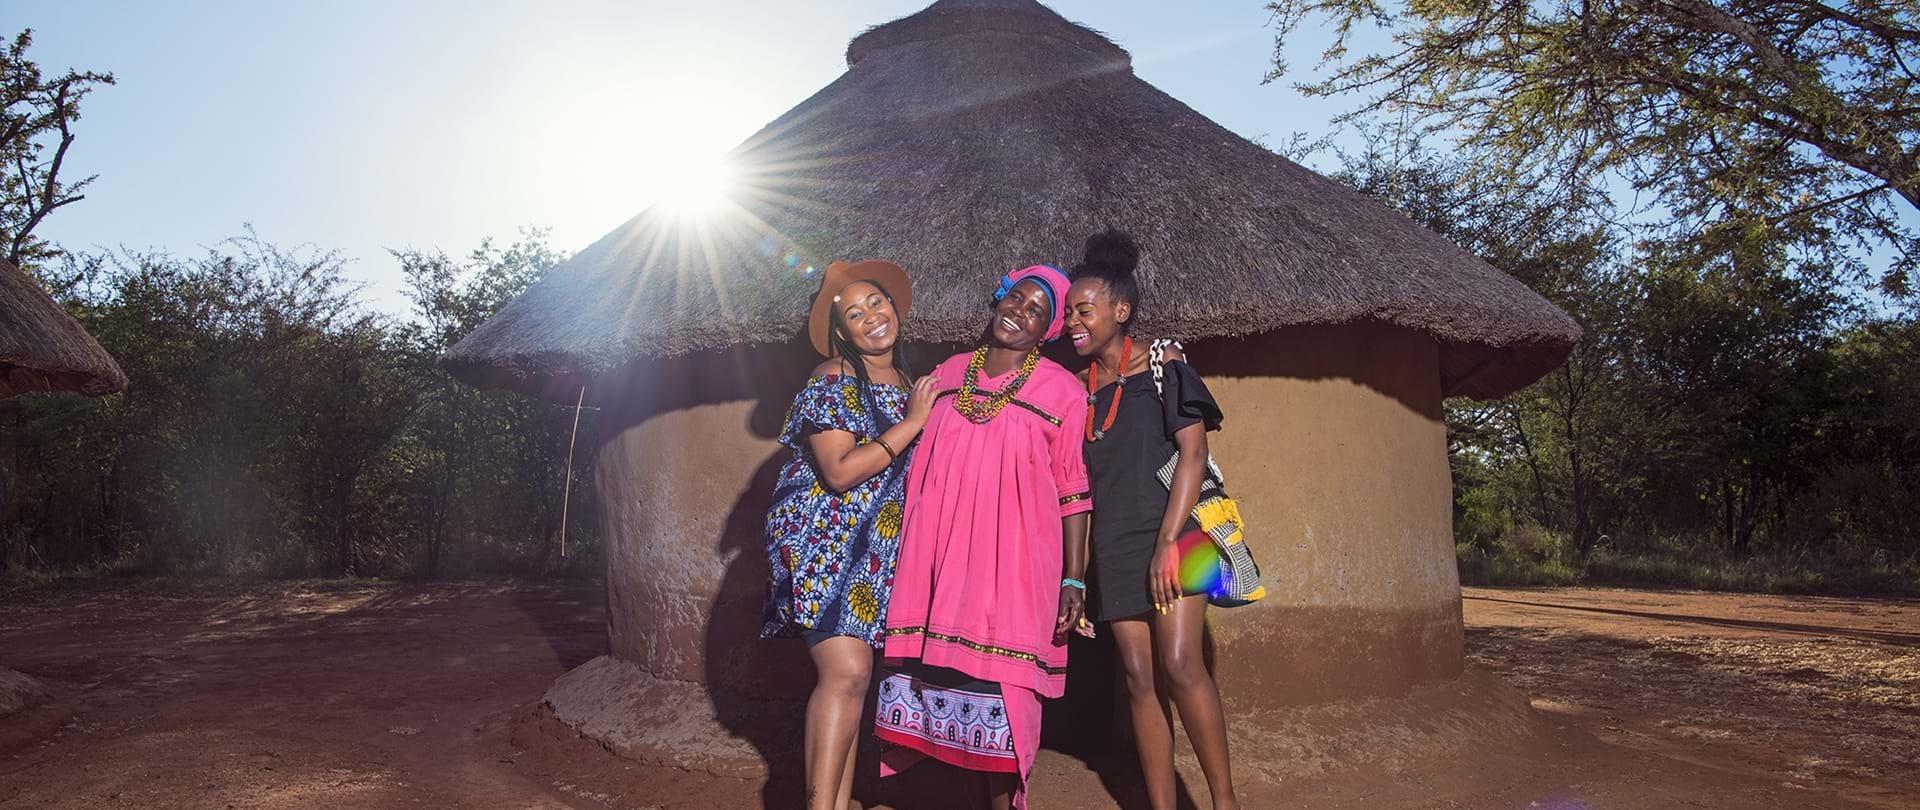 Bapedi history, traditions, culture and food (ZA)